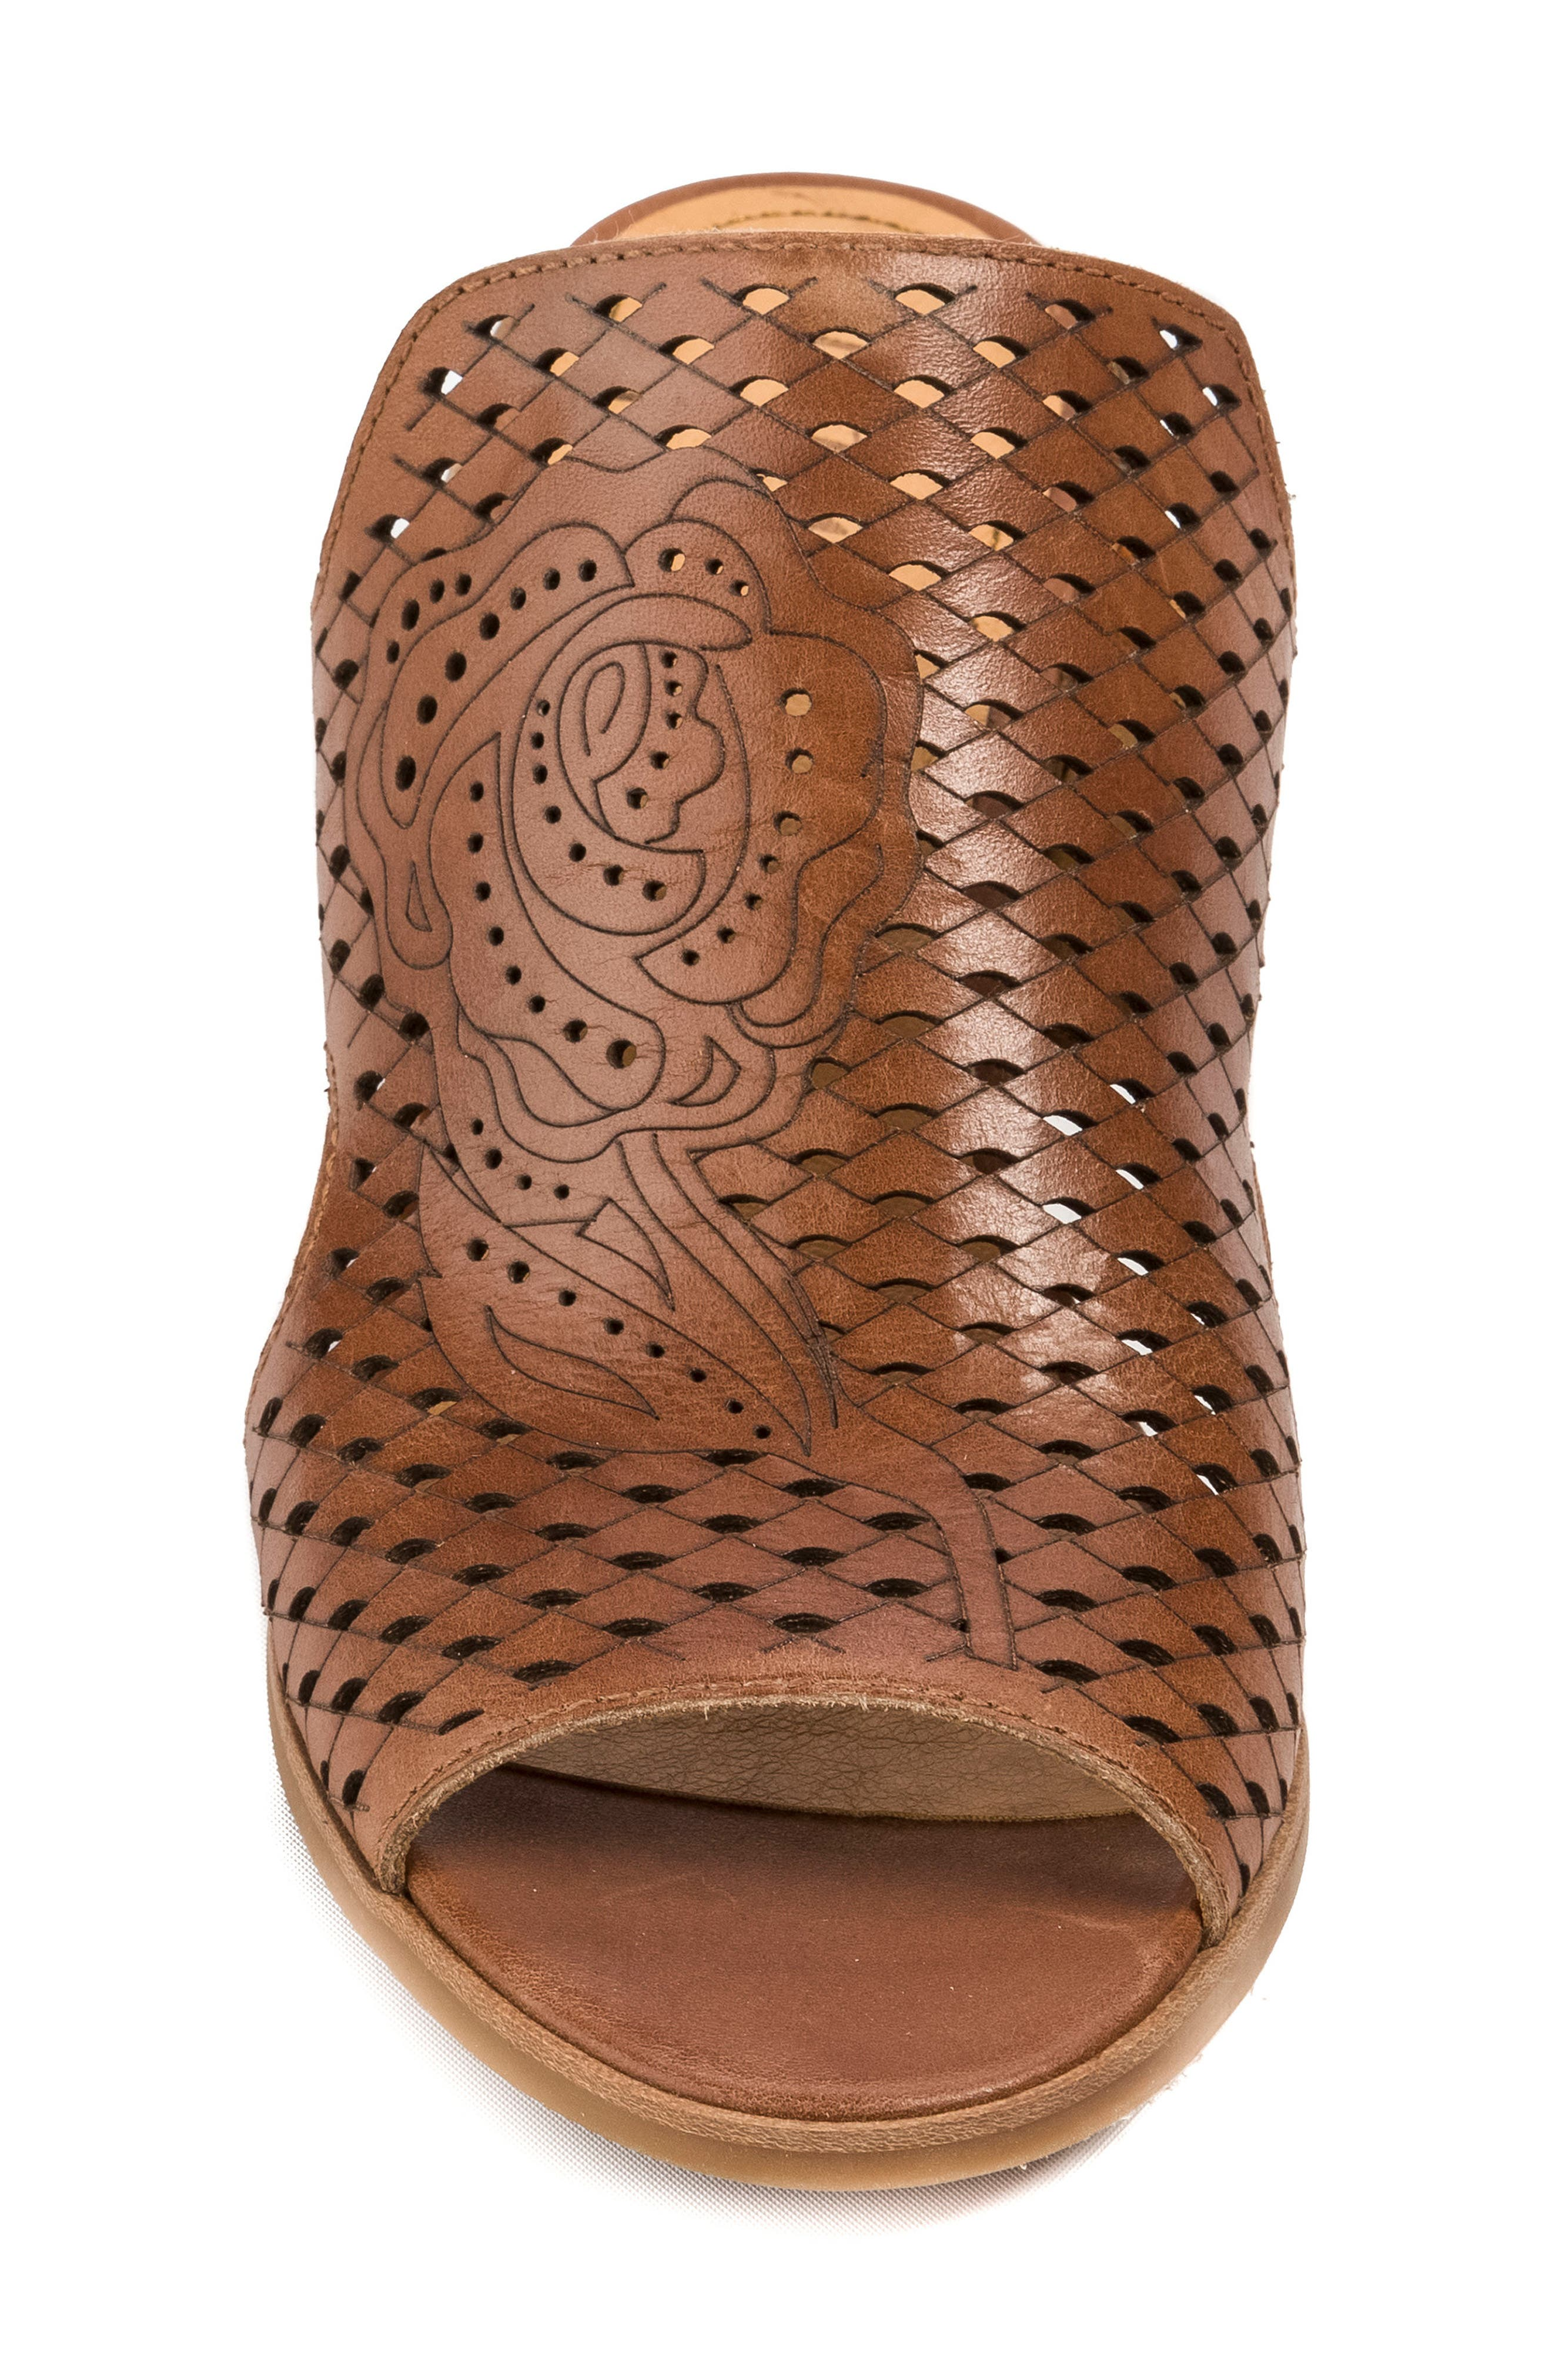 Janis Laser Cut Wedge Sandal,                             Alternate thumbnail 4, color,                             Brush Brown Leather